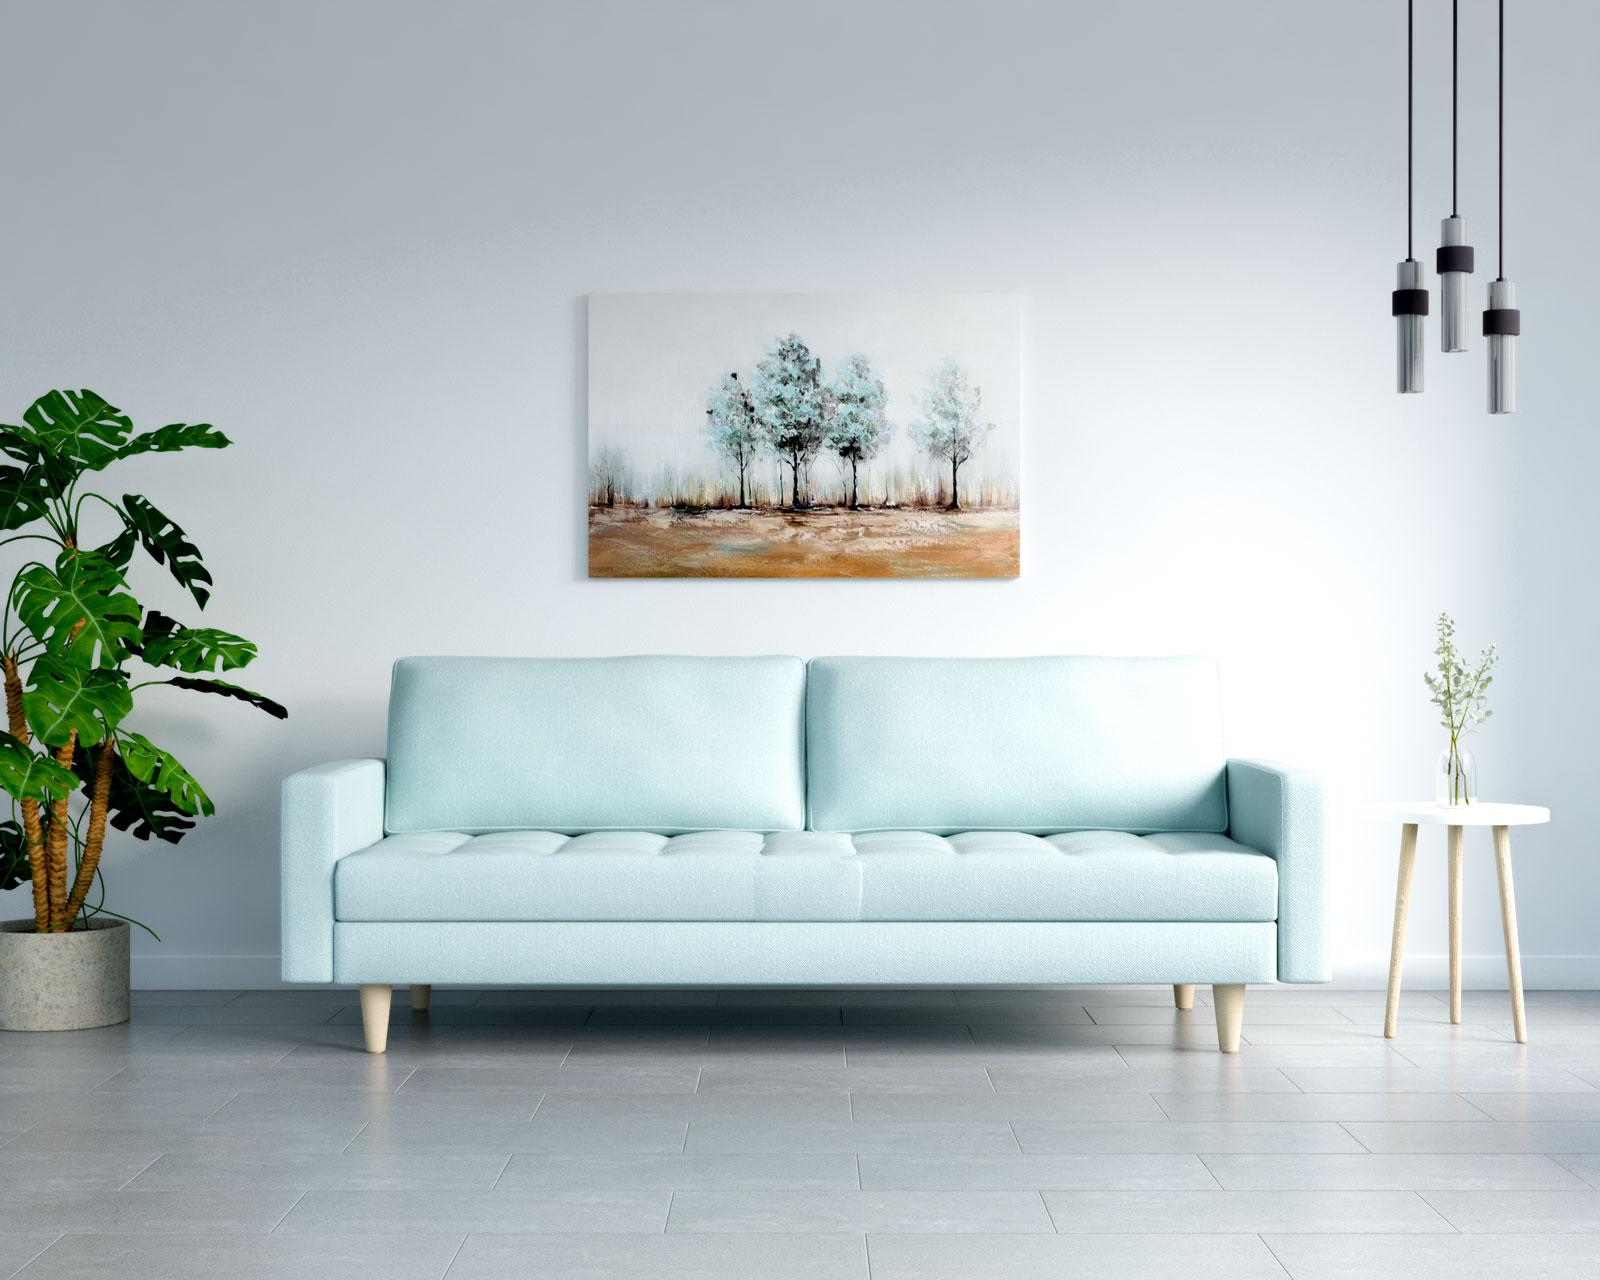 Cyan sofa with gray tile floors